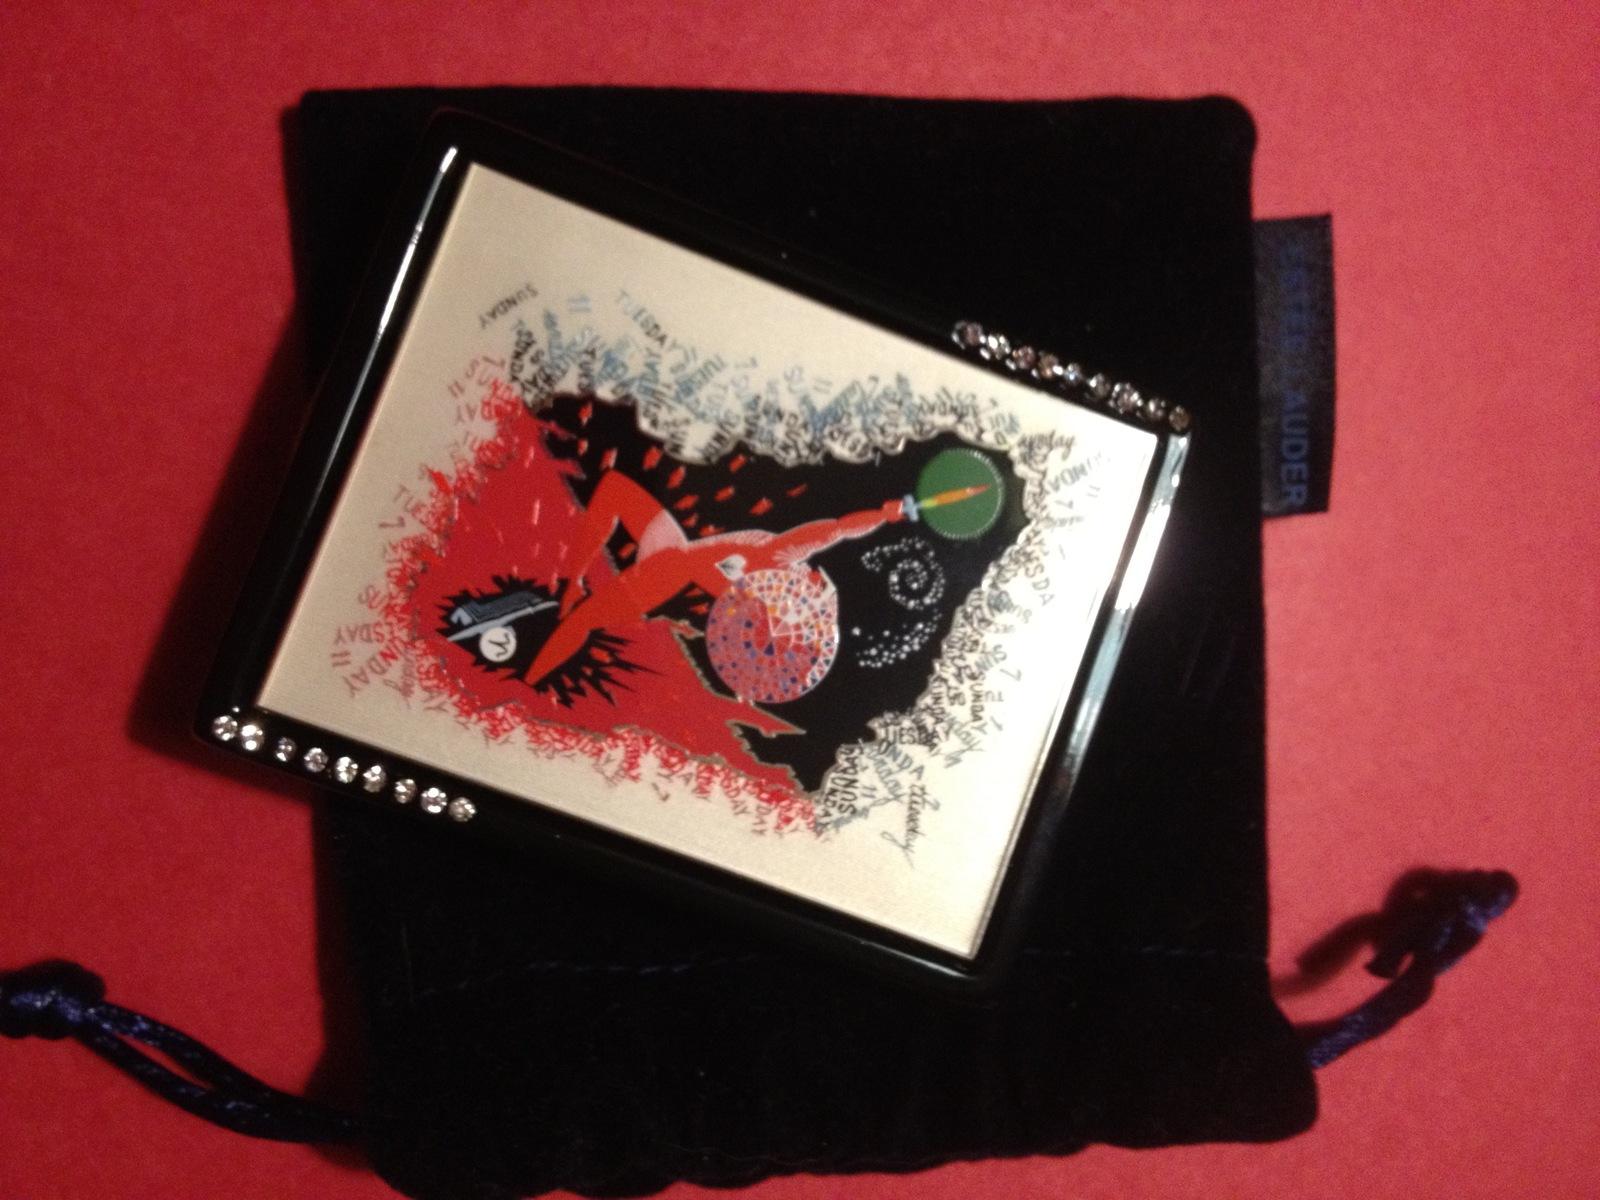 Estee Lauder ARIES ERTE ZODIAC Collection Powder Compact 2004 - FREE SHIPPING